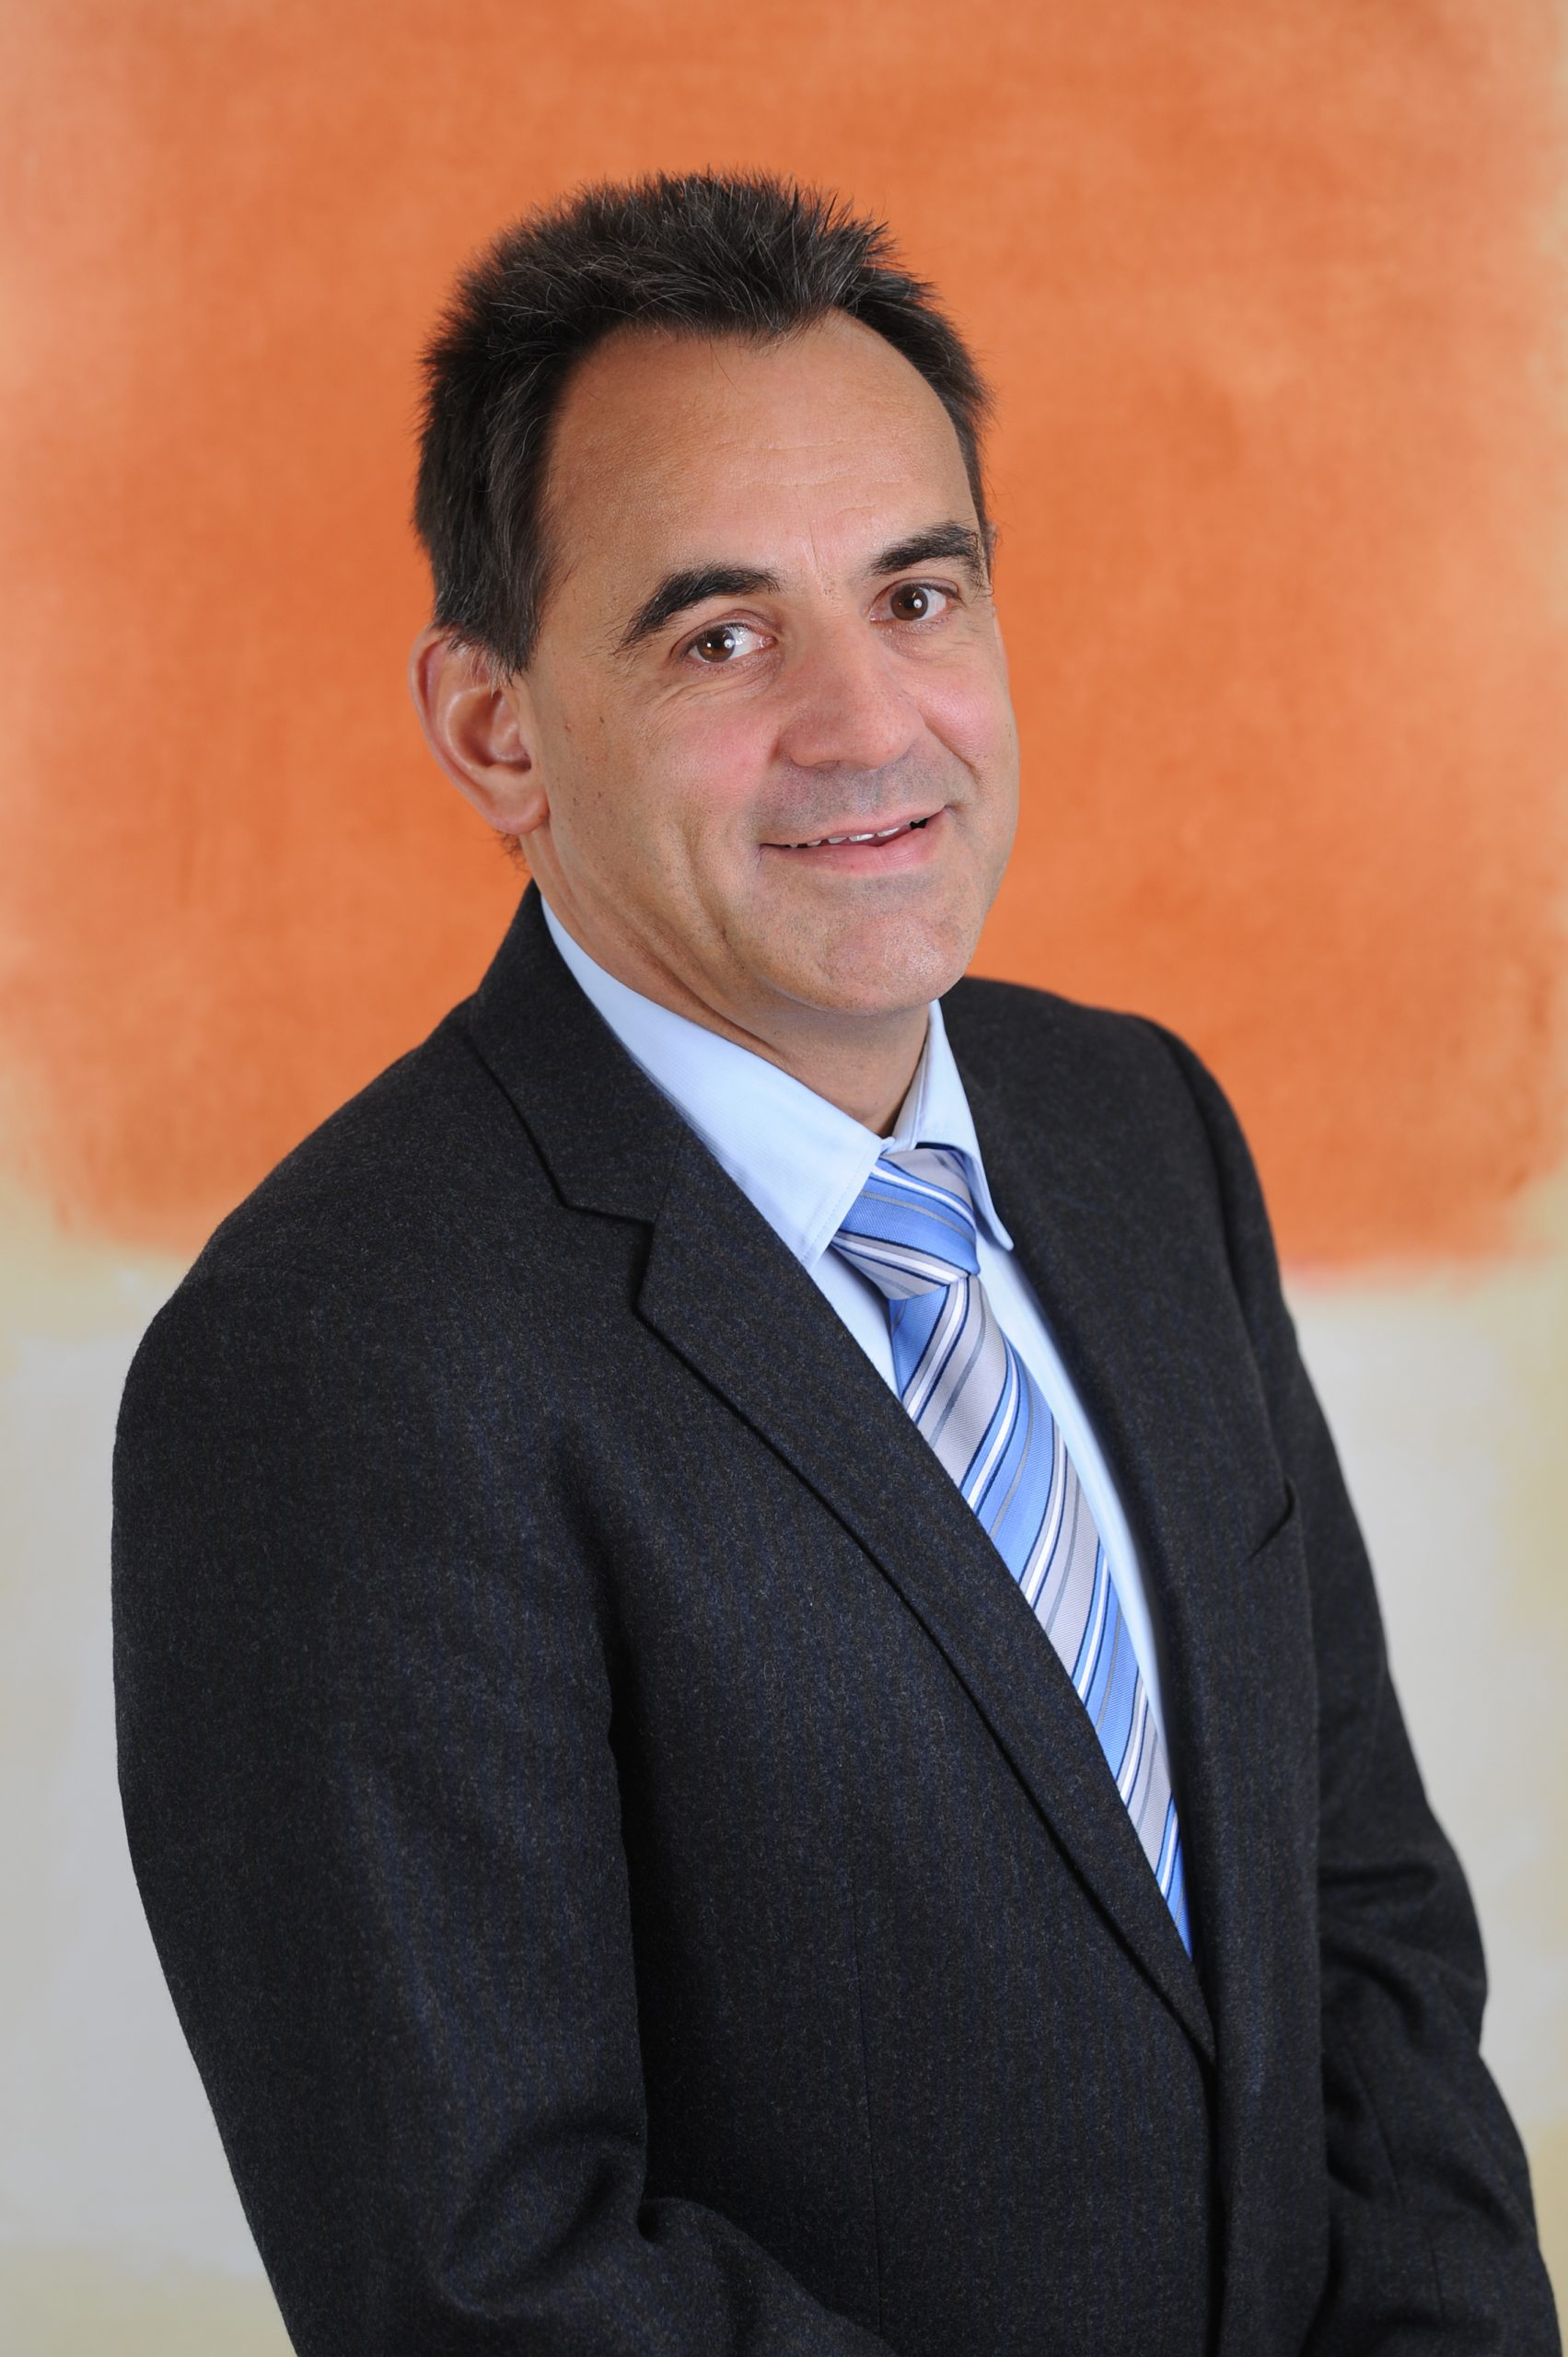 Porträtbild Dr. Markus Leser